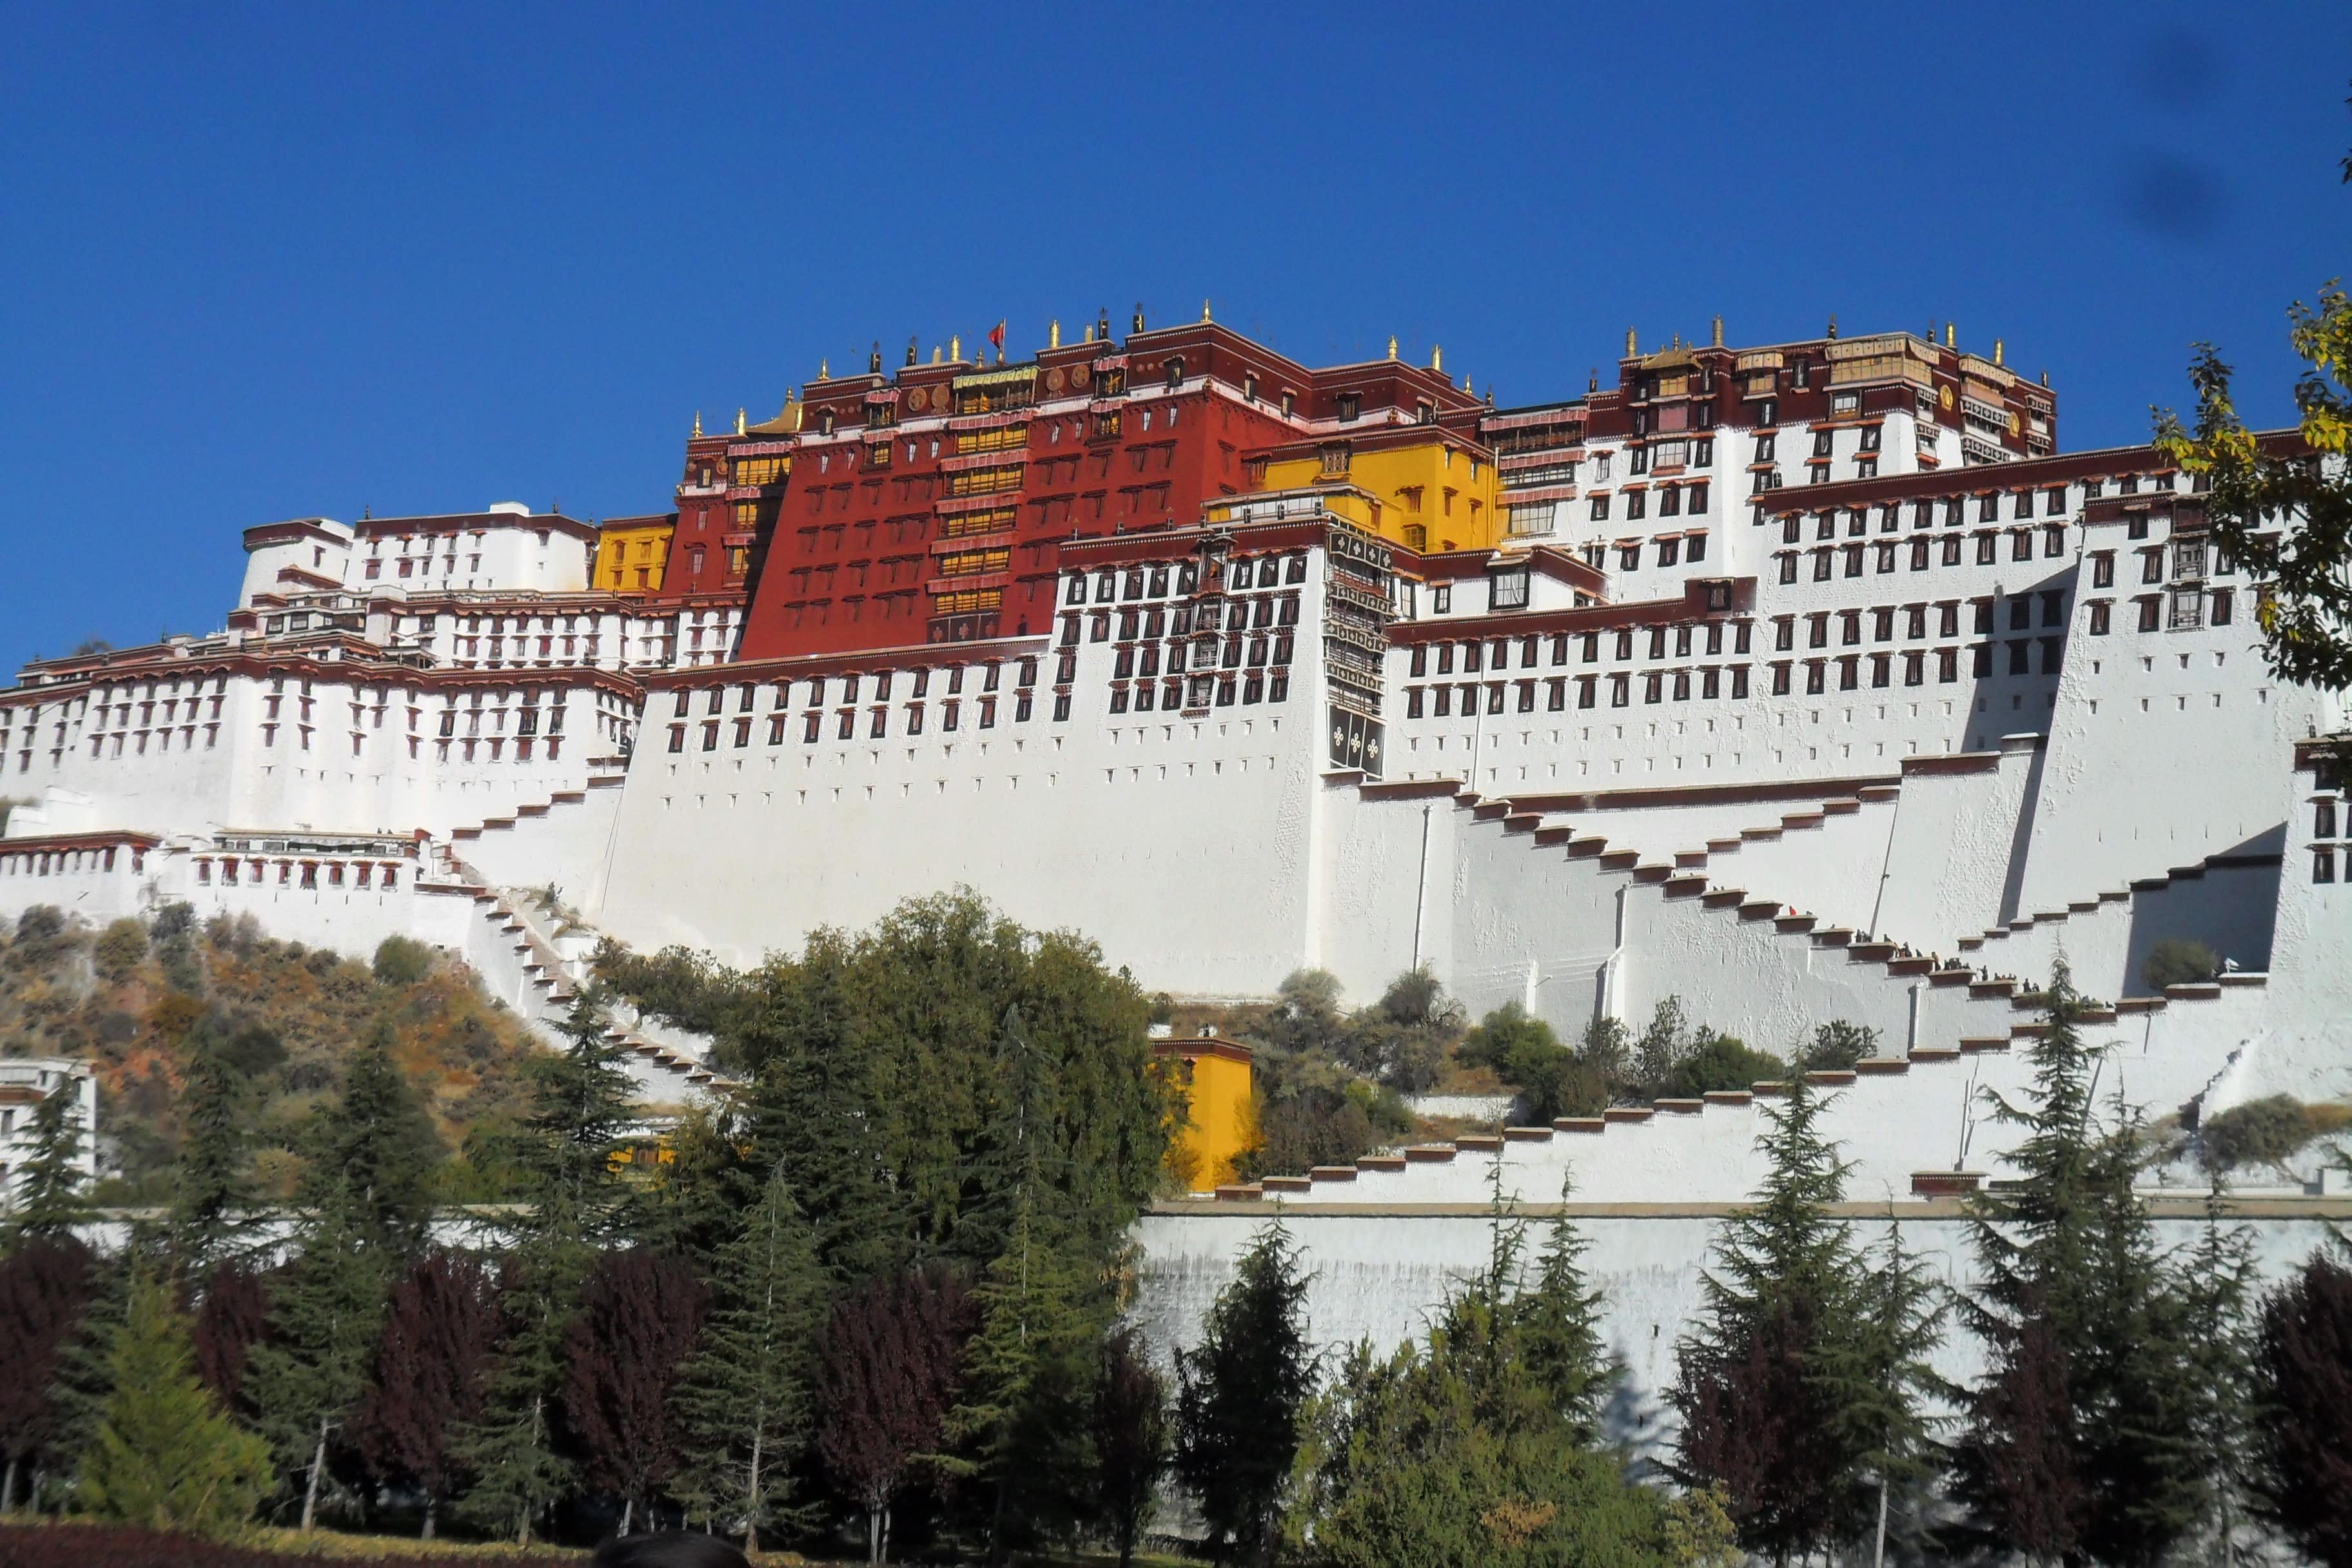 Enchanting Travels Tibet Tours Potala Palace